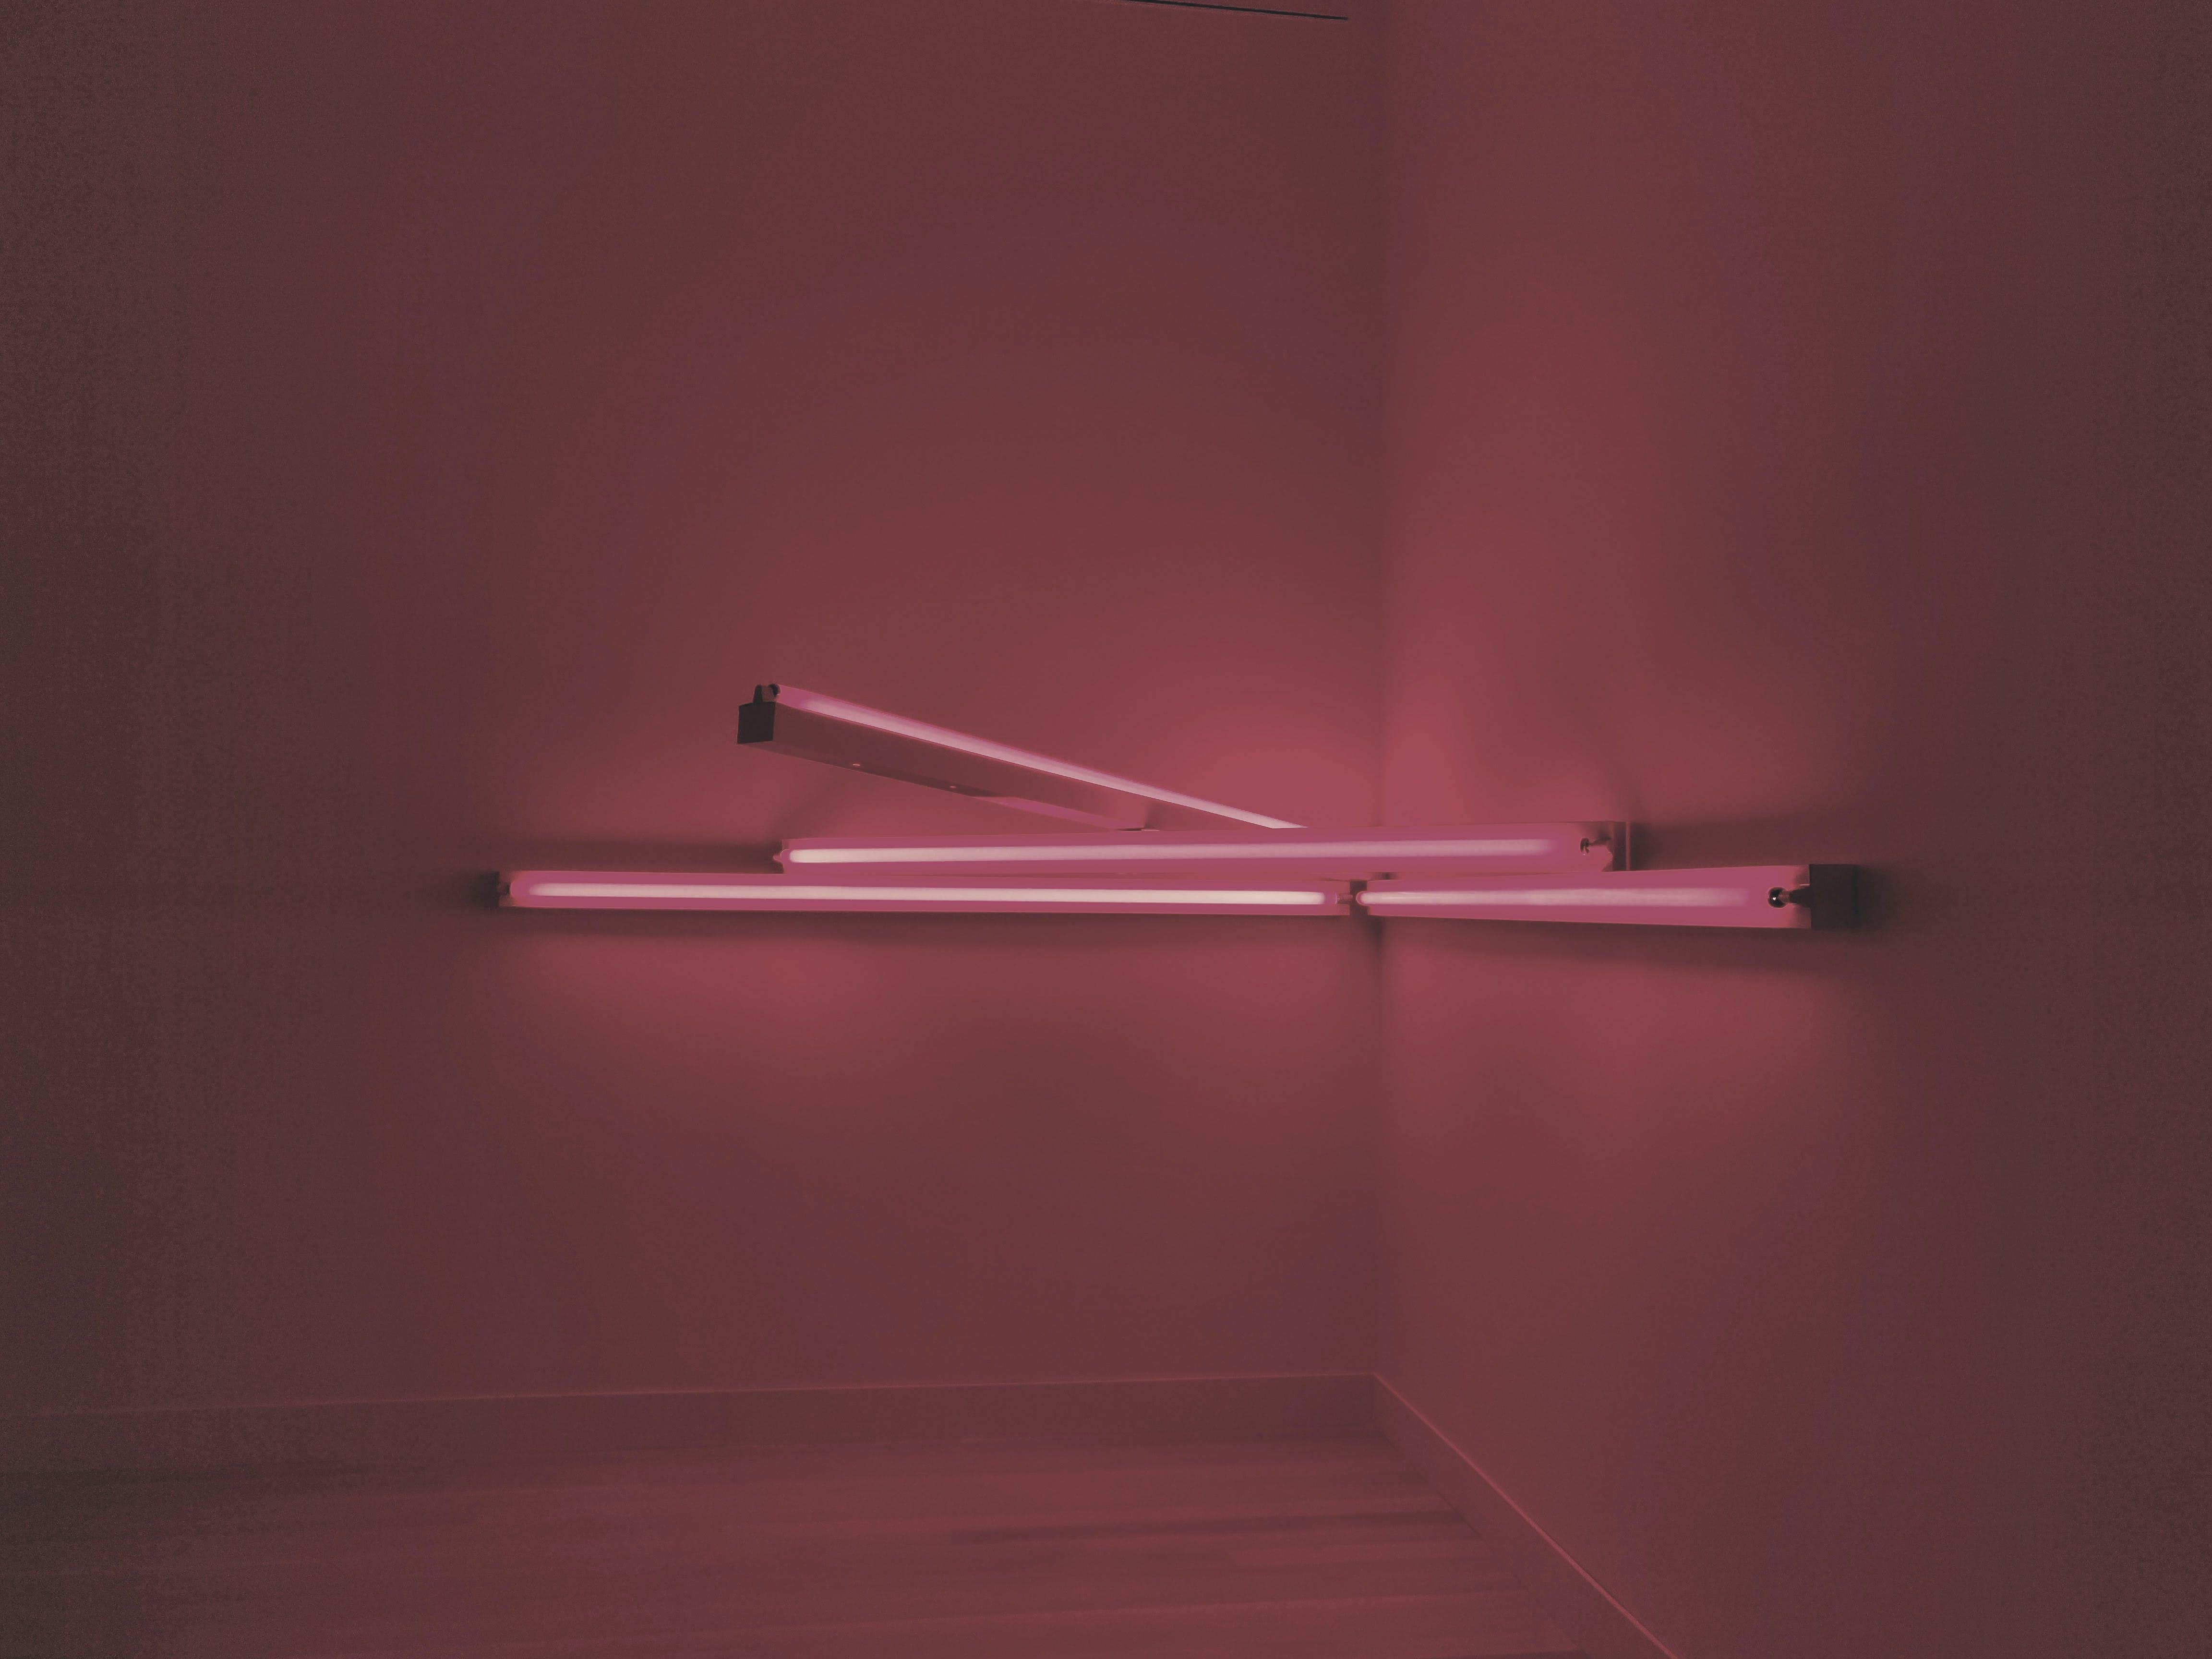 Fotos de stock gratuitas de adentro, fluorescente, fondo rosa, habitación